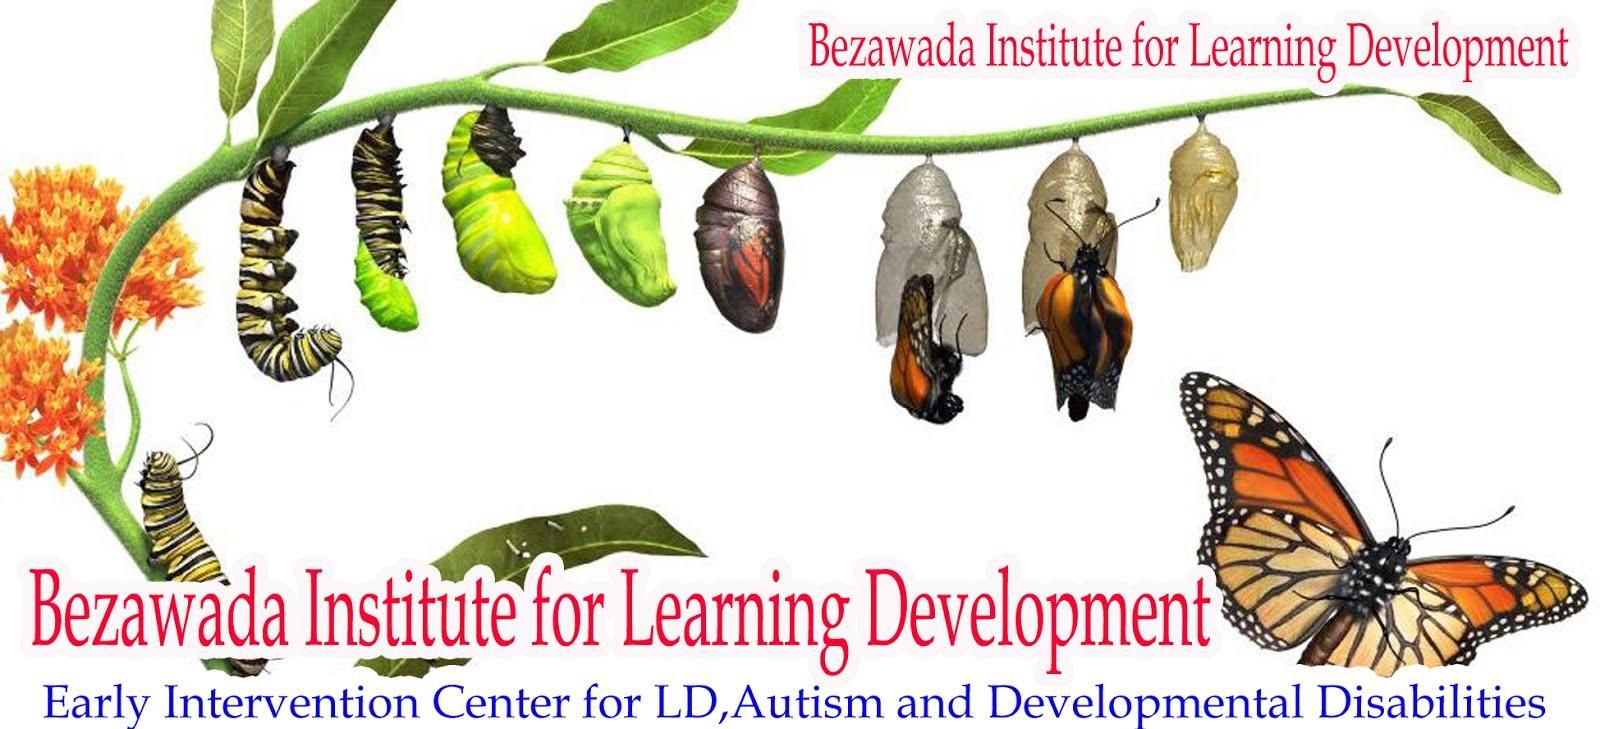 Bezawada Institute for Learning Development